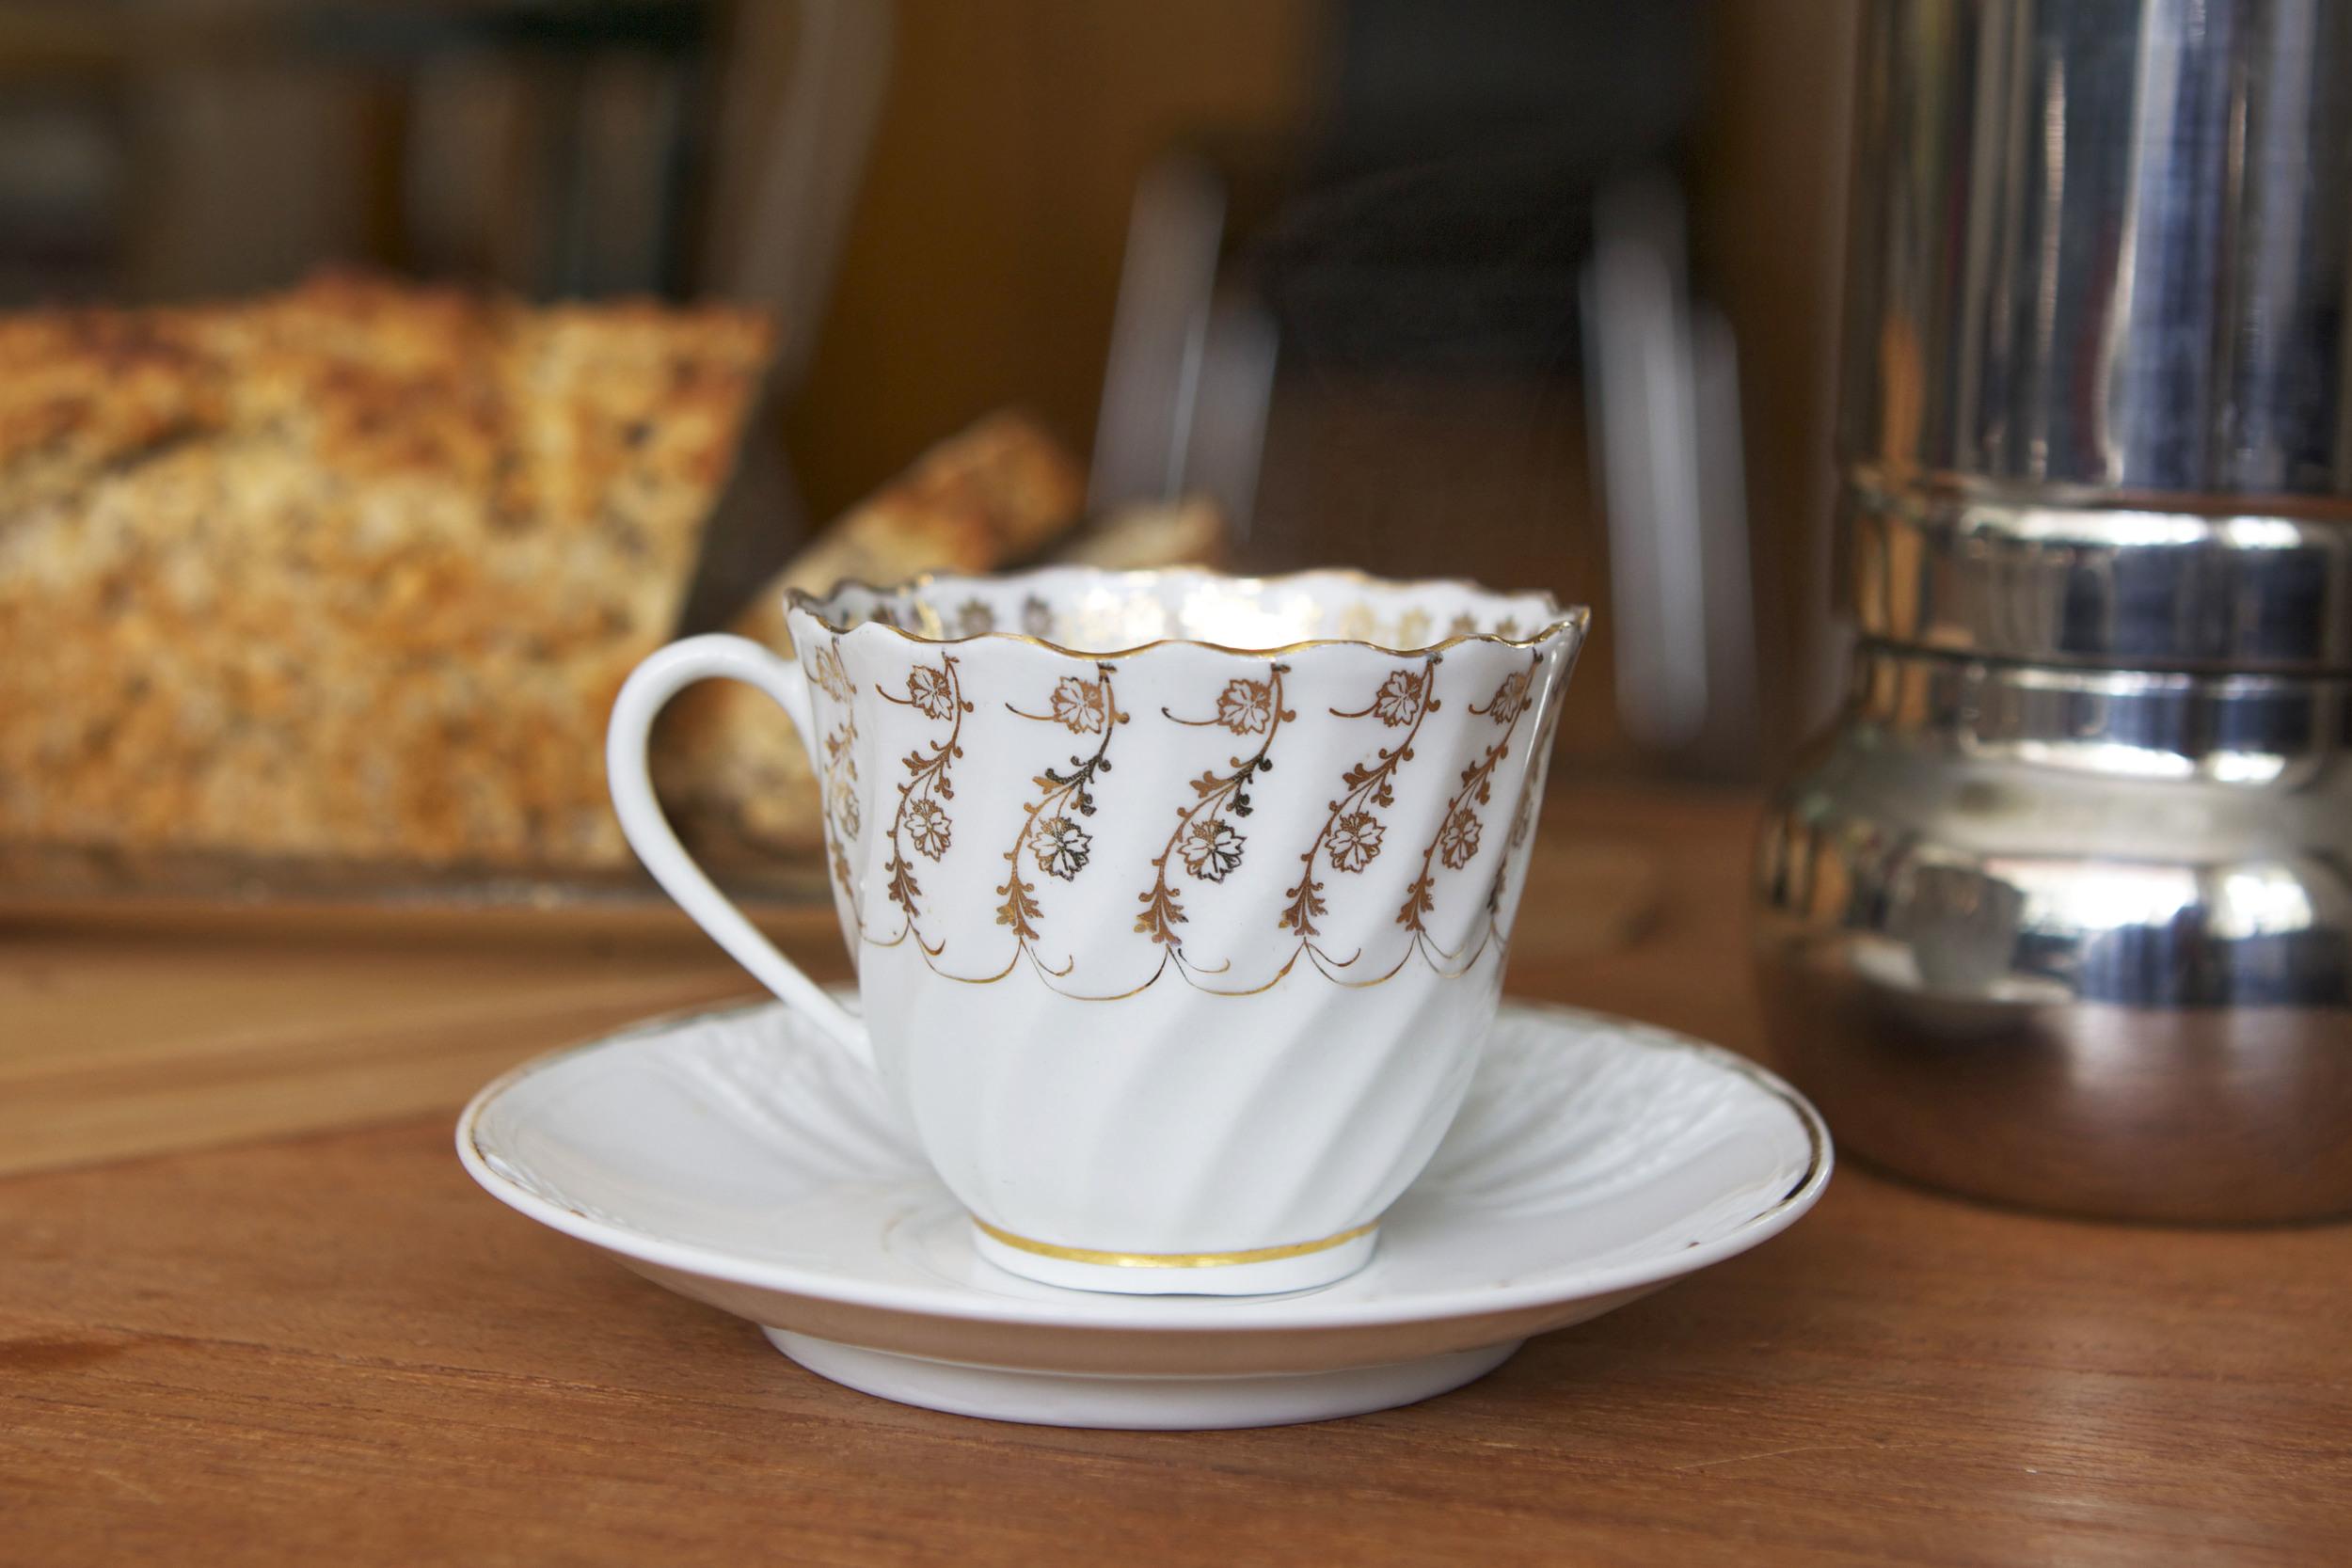 vintagecoffee.jpg